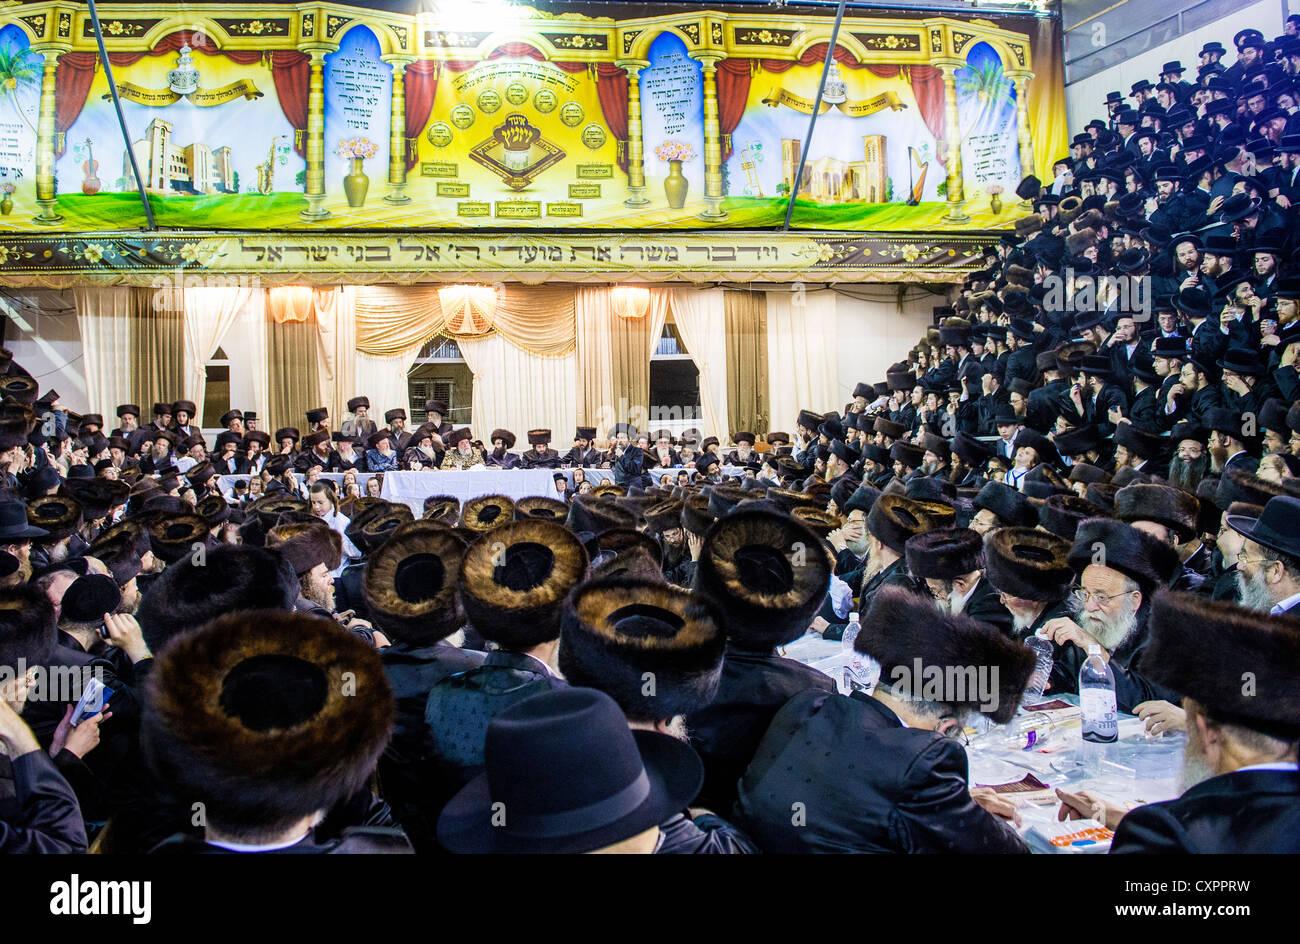 Orthodox Jews from the Hasidic dynasty Vizhnitz celebrates Simchat beit Hashoeivah in Bnei Brak Israel - Stock Image